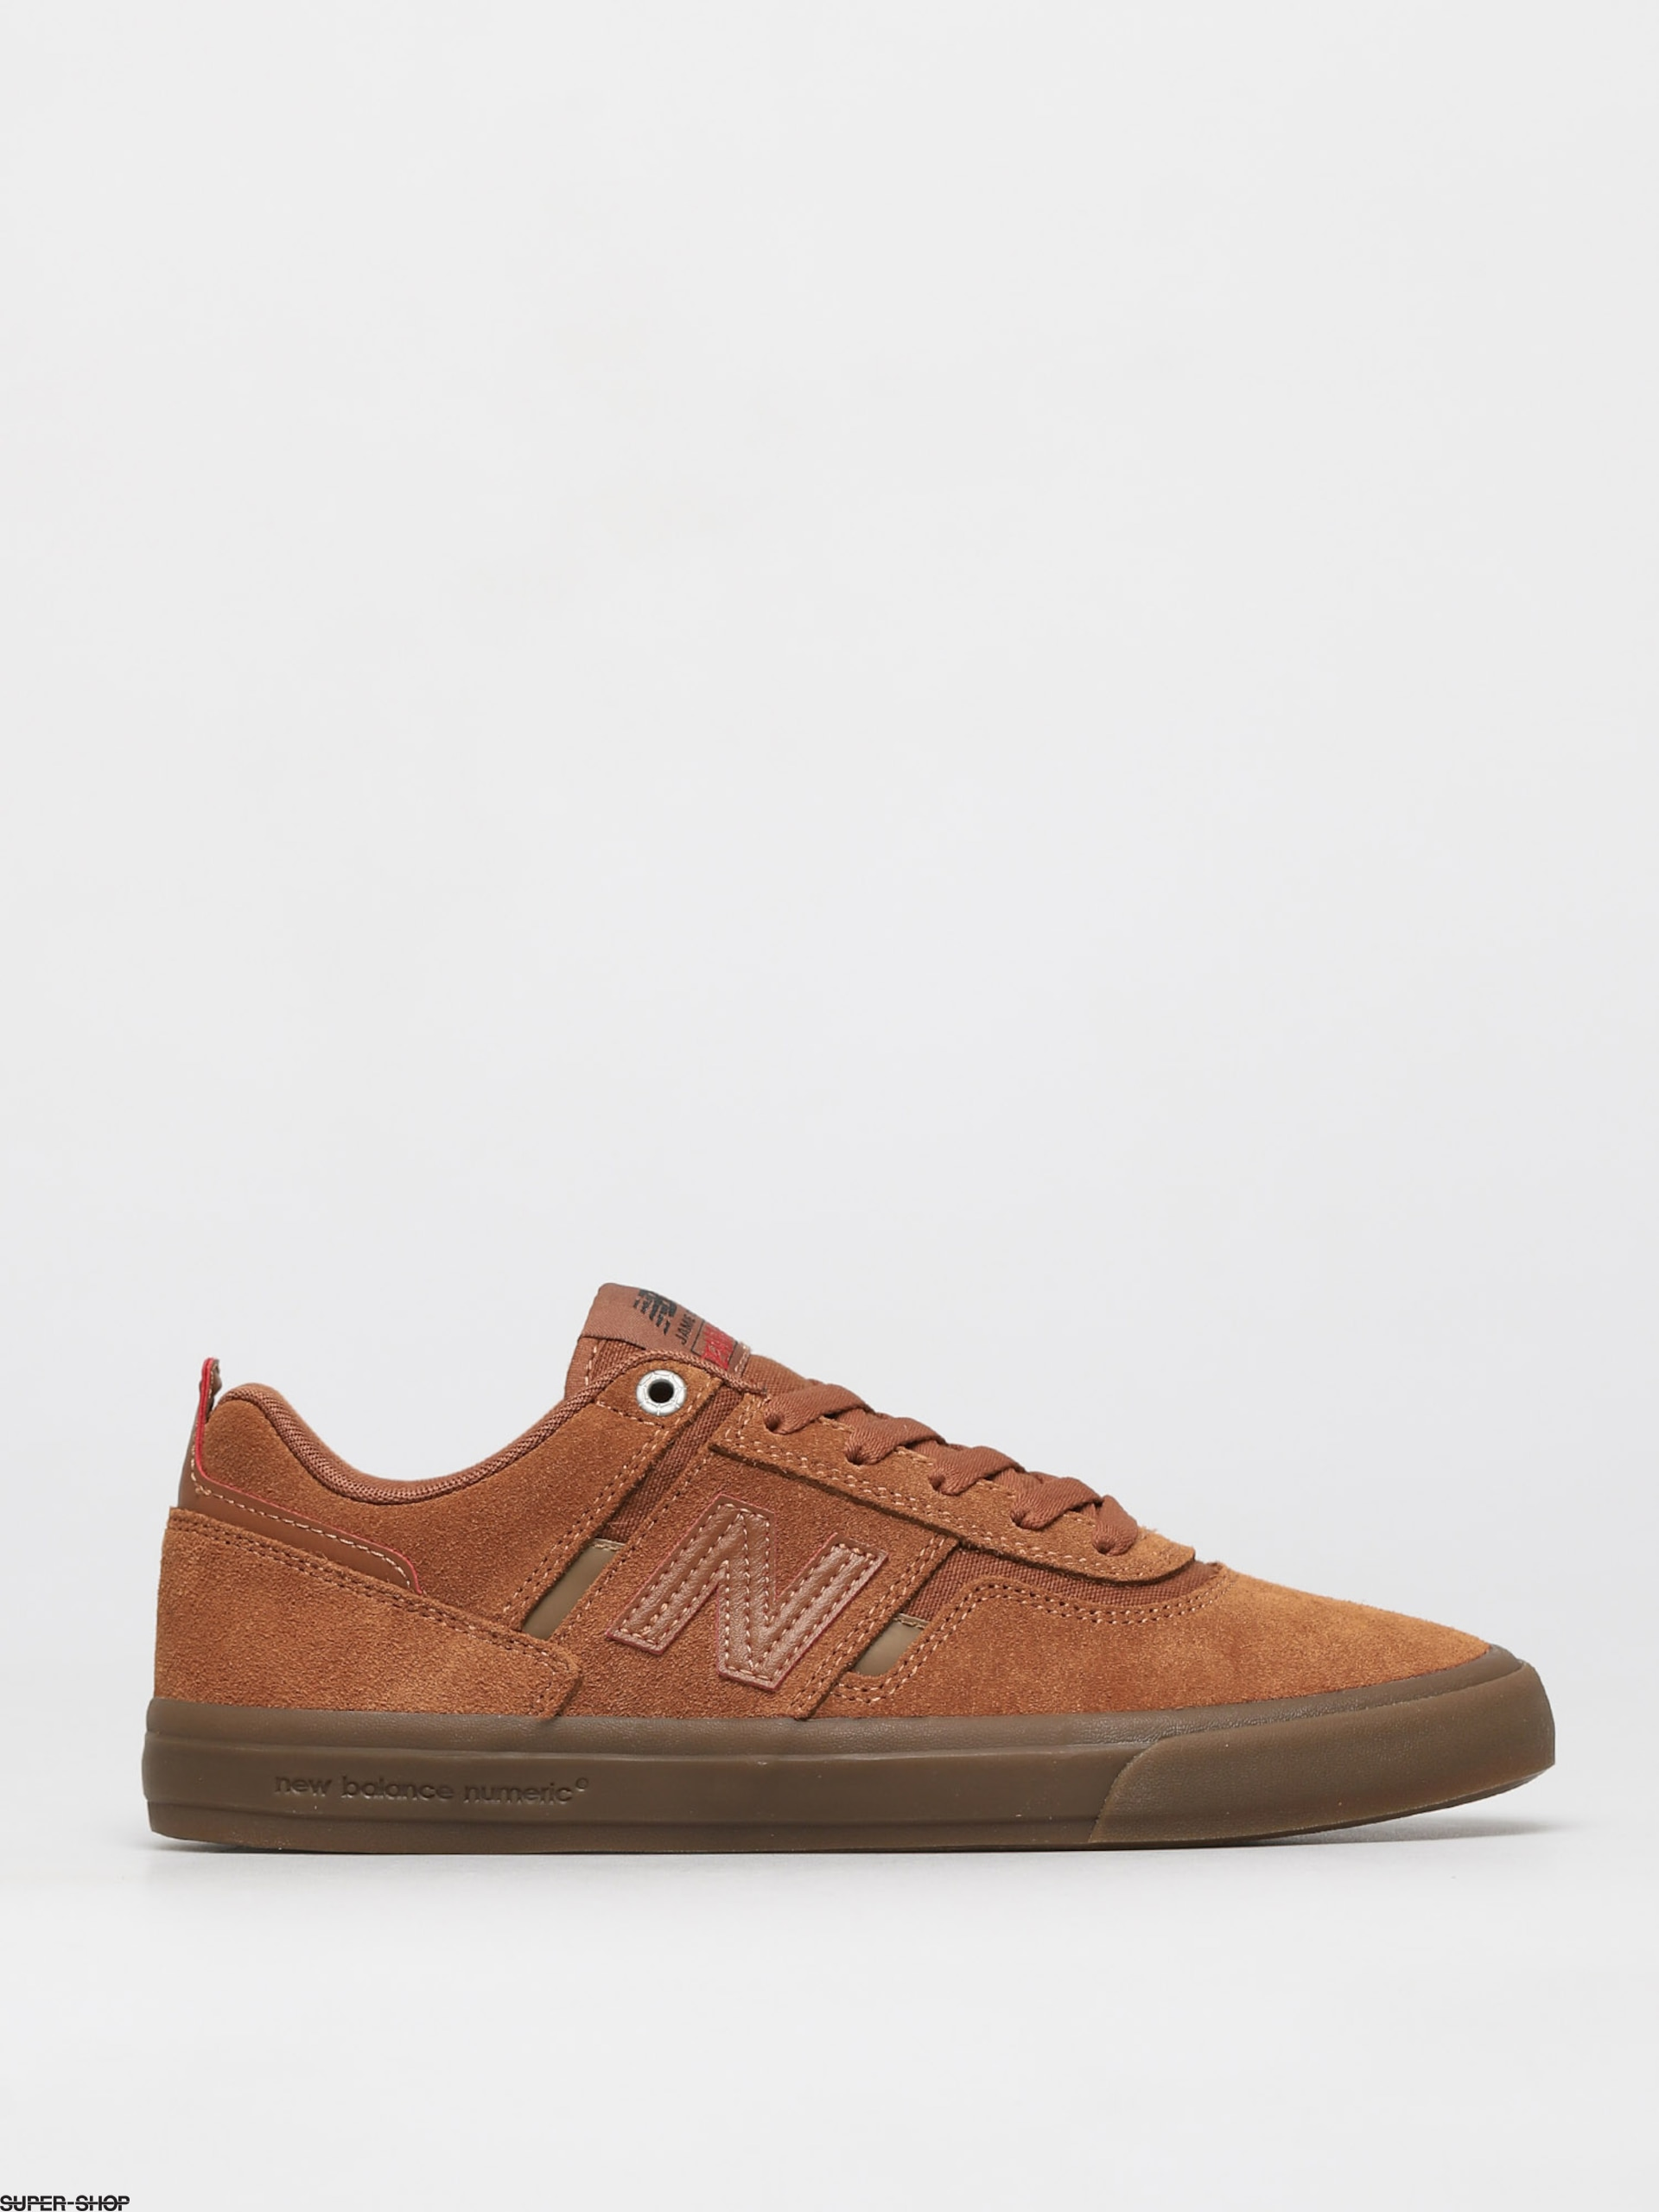 revista Perímetro haga turismo  New Balance 306 Shoes (deathwish brown)